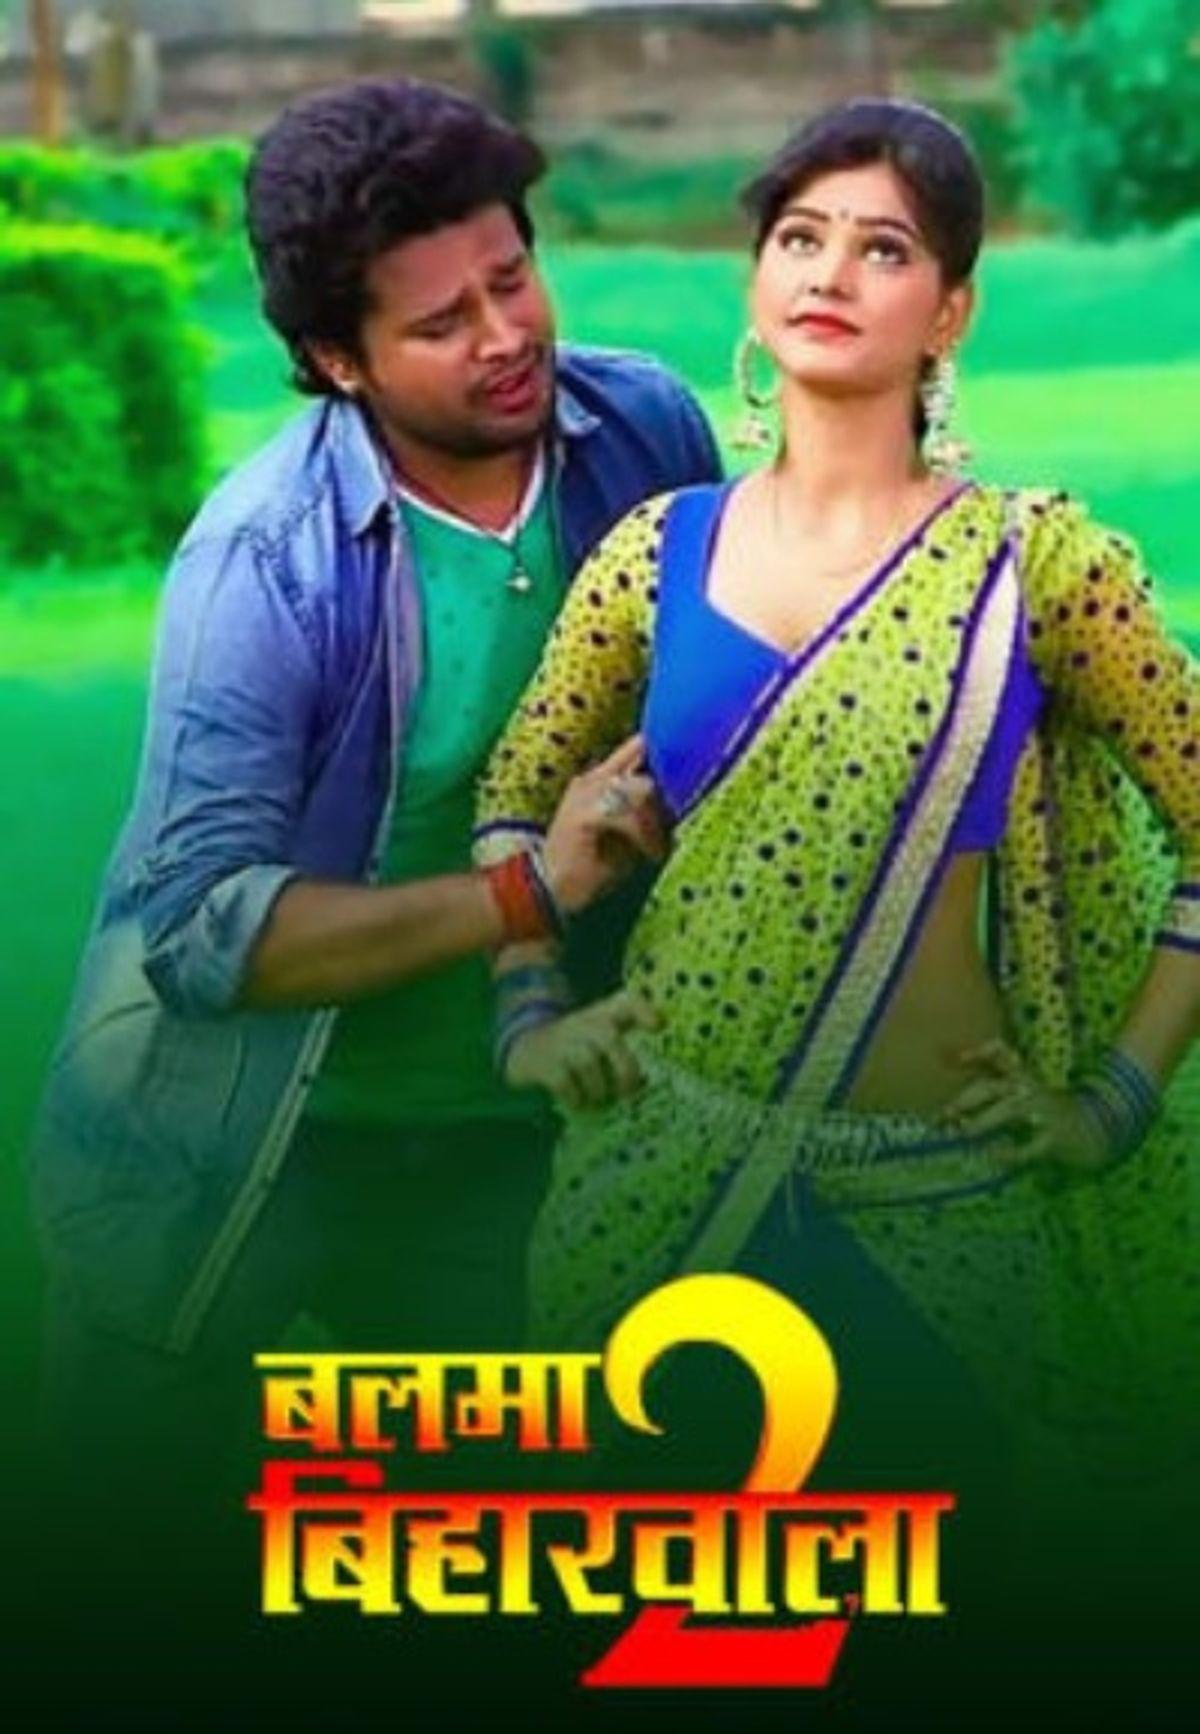 Anil Samrat Best Movies, TV Shows and Web Series List